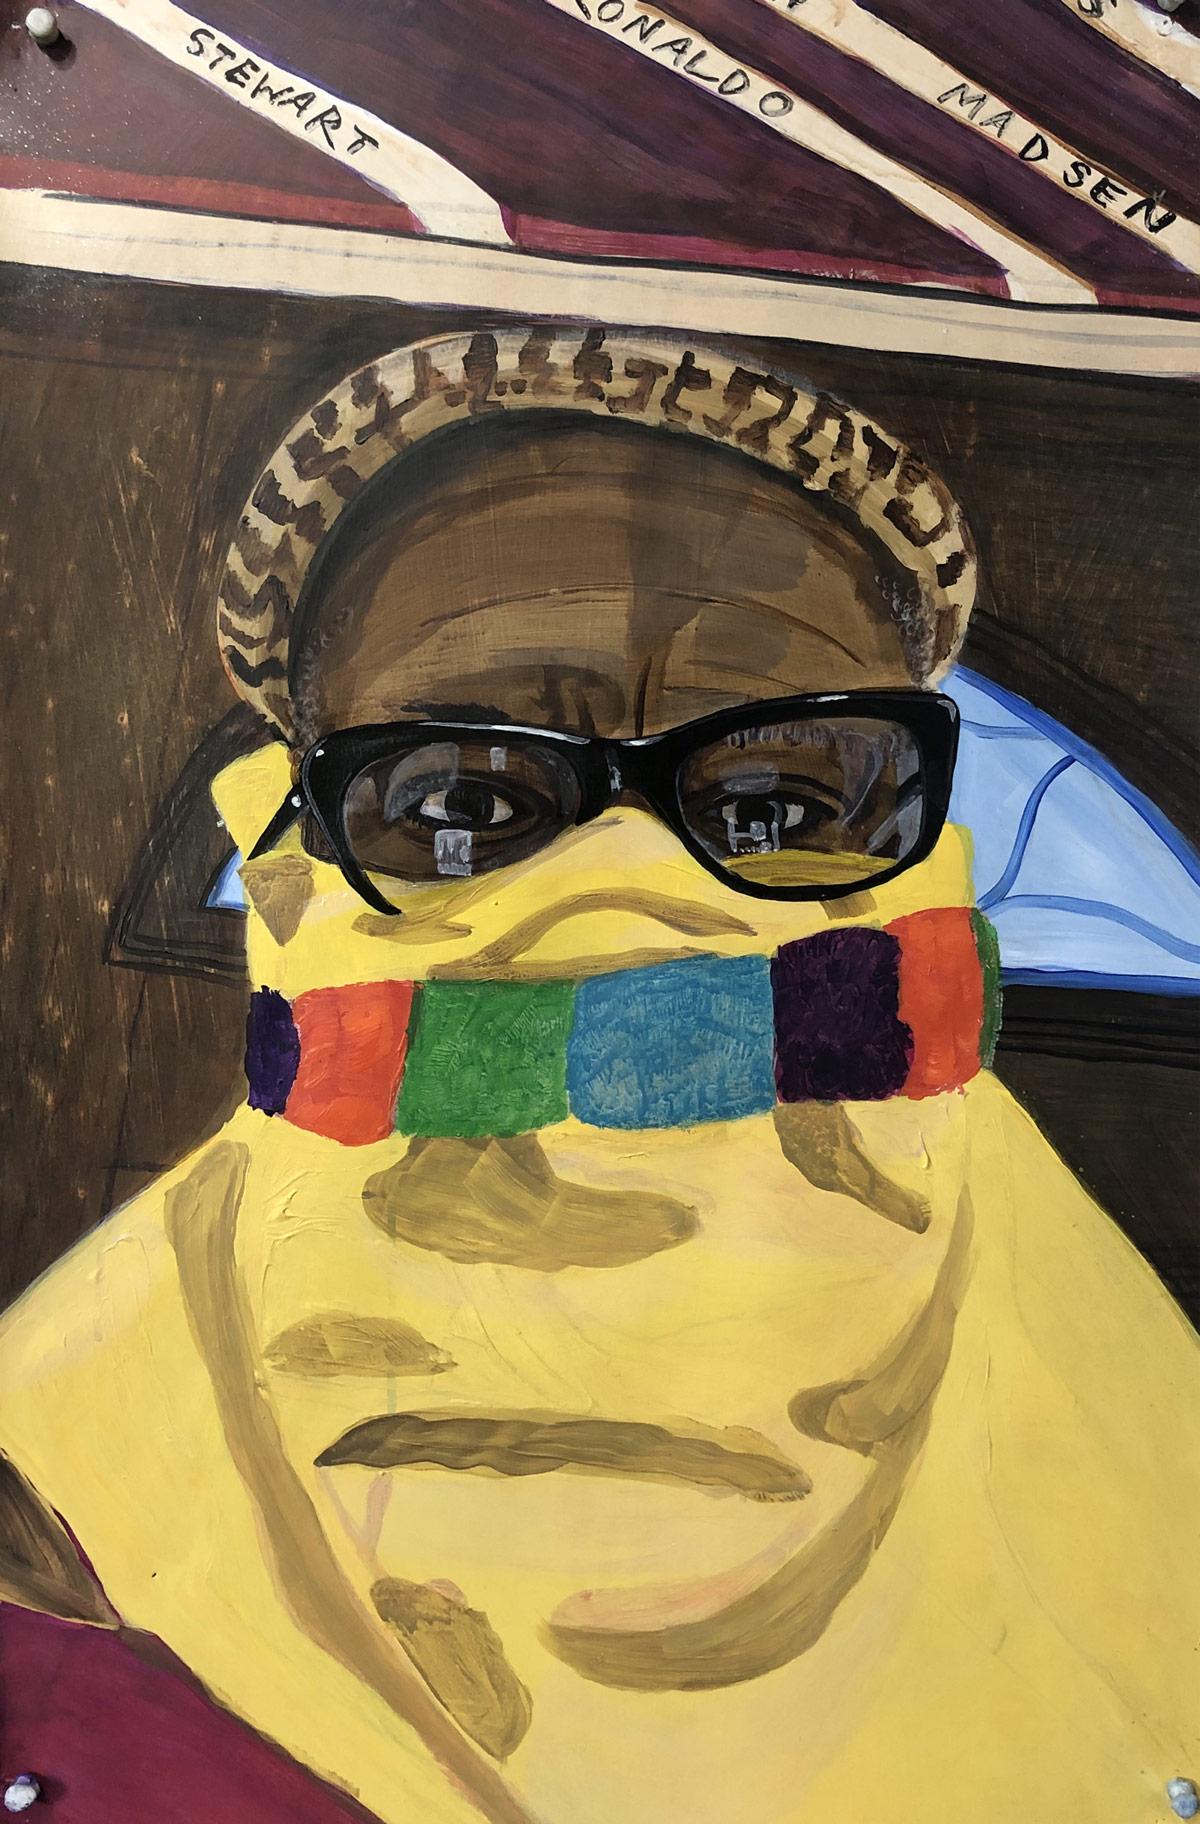 Trenton-Doyle-Hancock-artist-Houston-TX-2020-acylic-on-paper-mounted-to-canvas-23.5-x-38